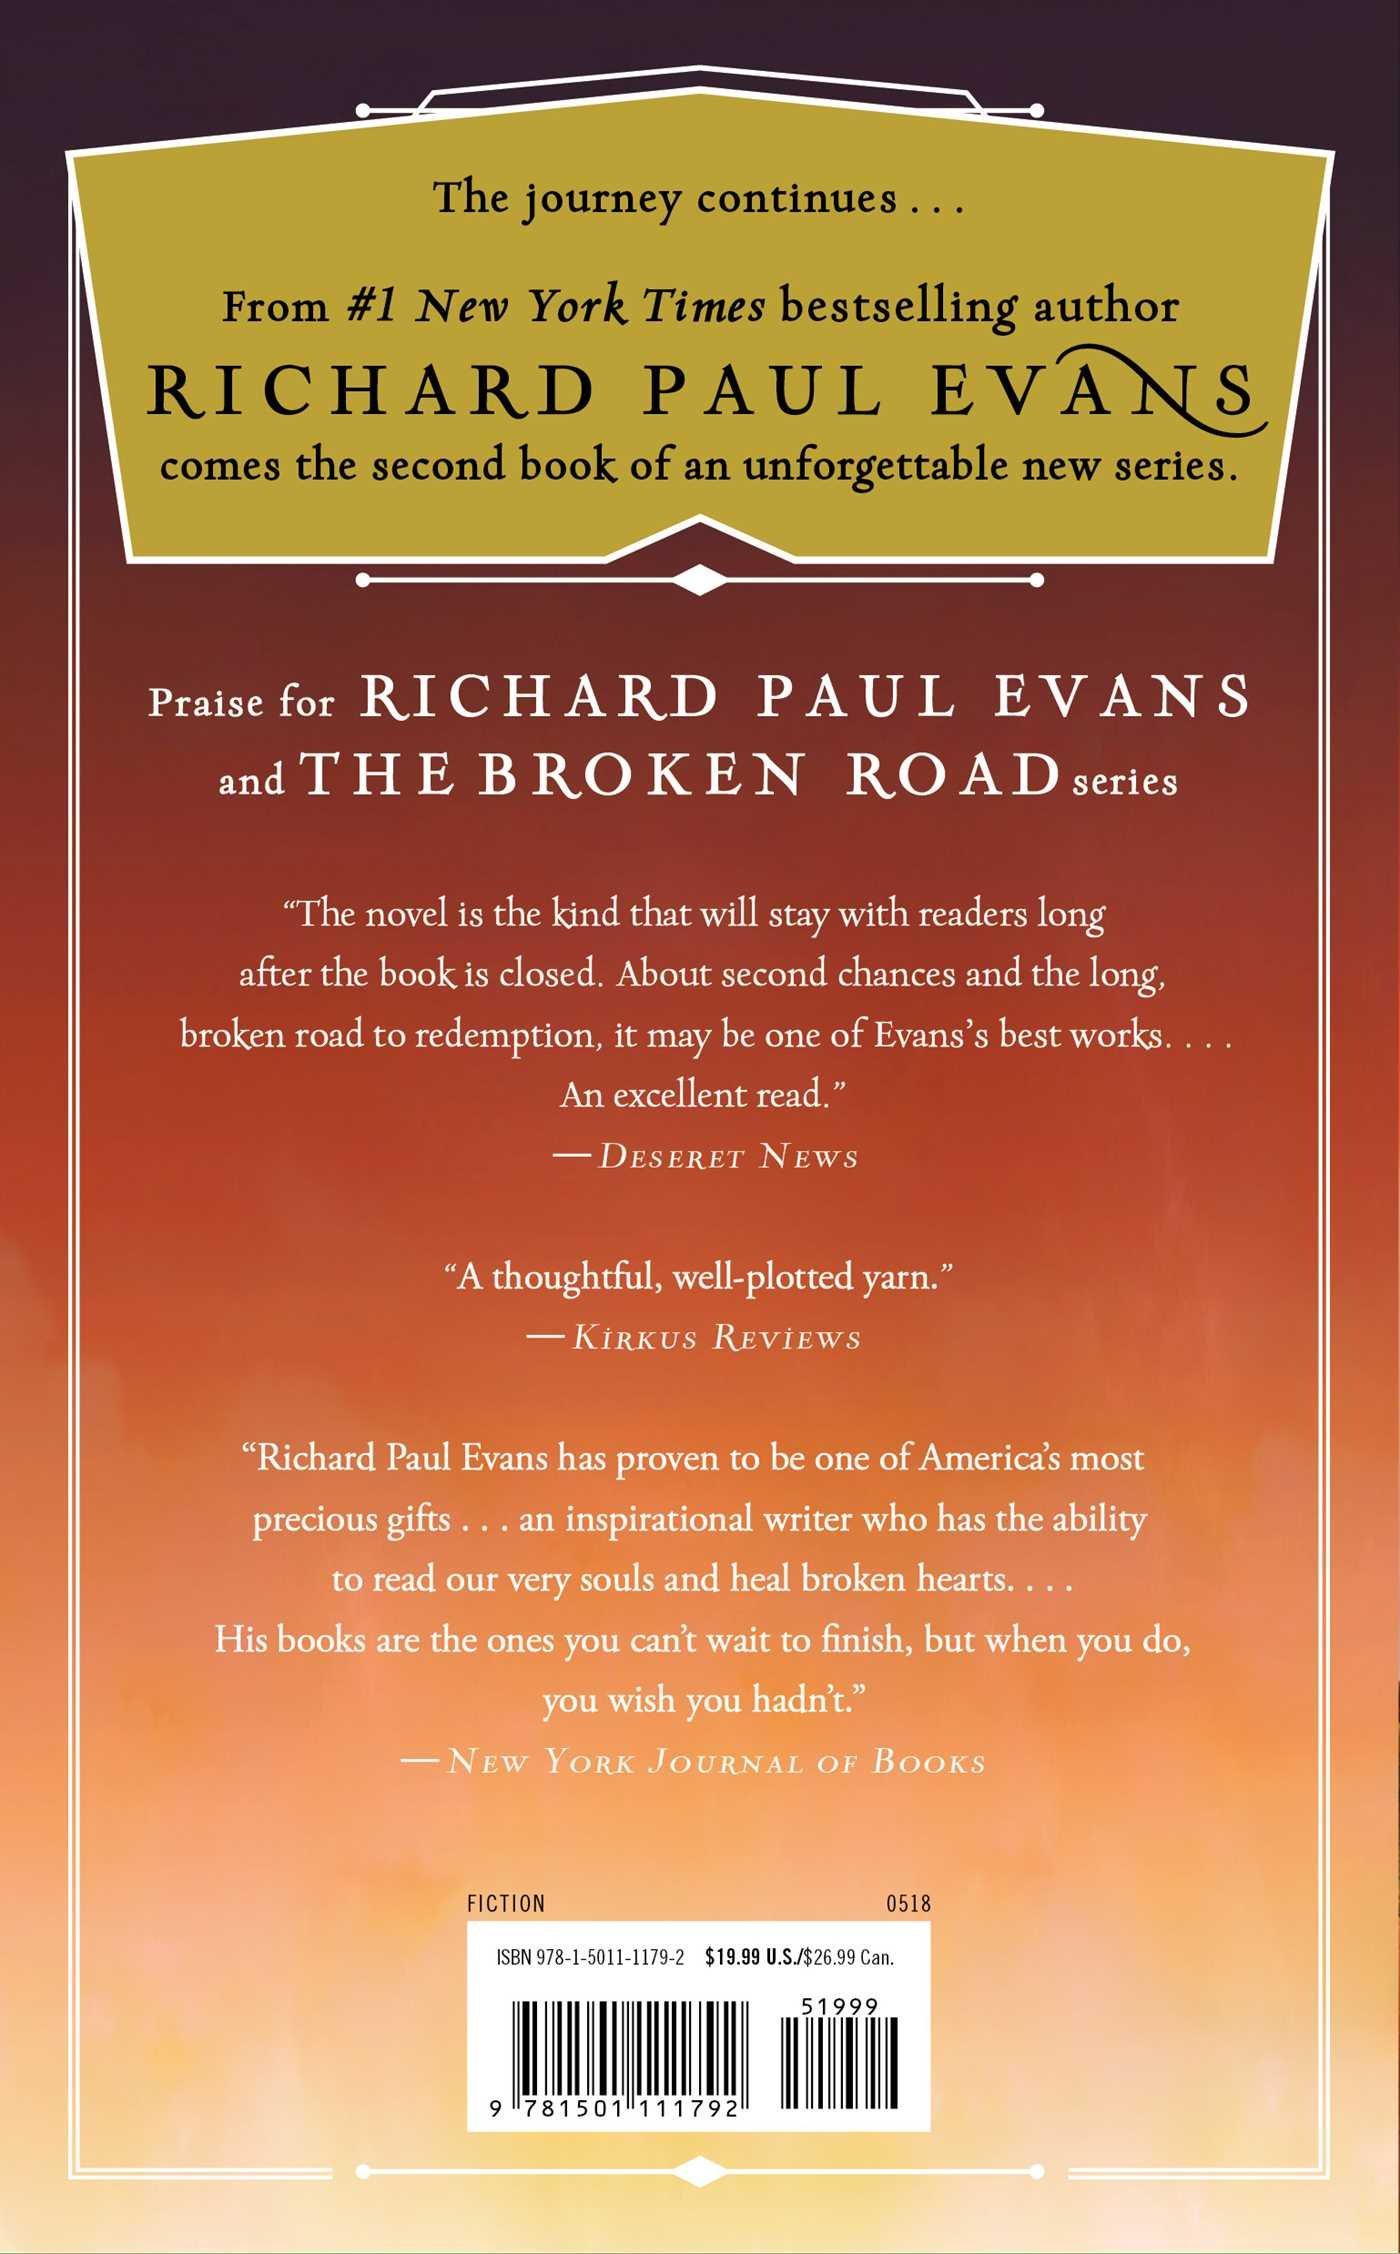 The Forgotten Road (The Broken Road Series): Richard Paul Evans:  9781501111792: Amazon.com: Books